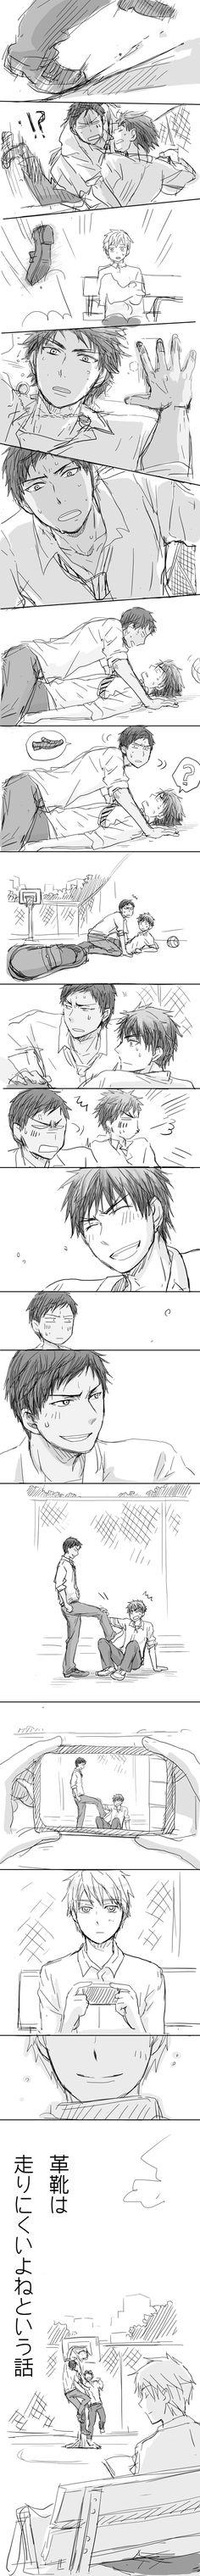 Oh, Kuroko... :') so proud of you, darlin.   [AoKaga / Bromance / SO CUTE / OT3 / Kuroko no Basuke / Humor Comic]